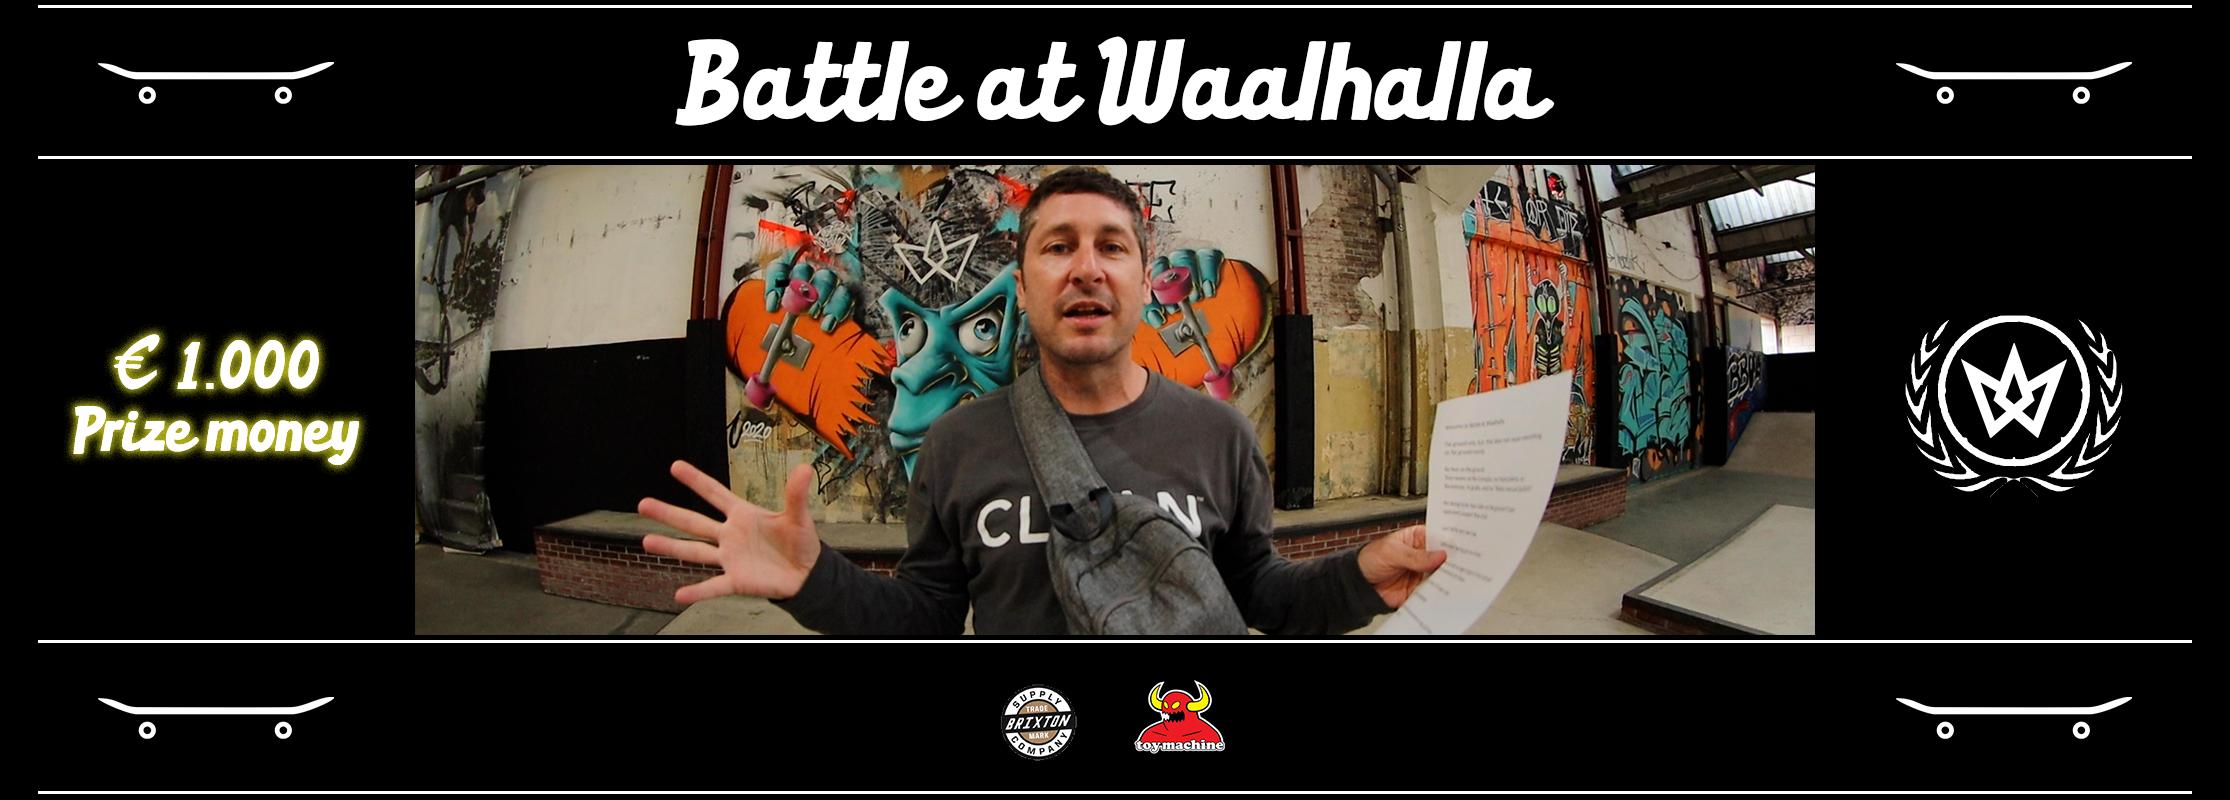 Battle at Waalhalla